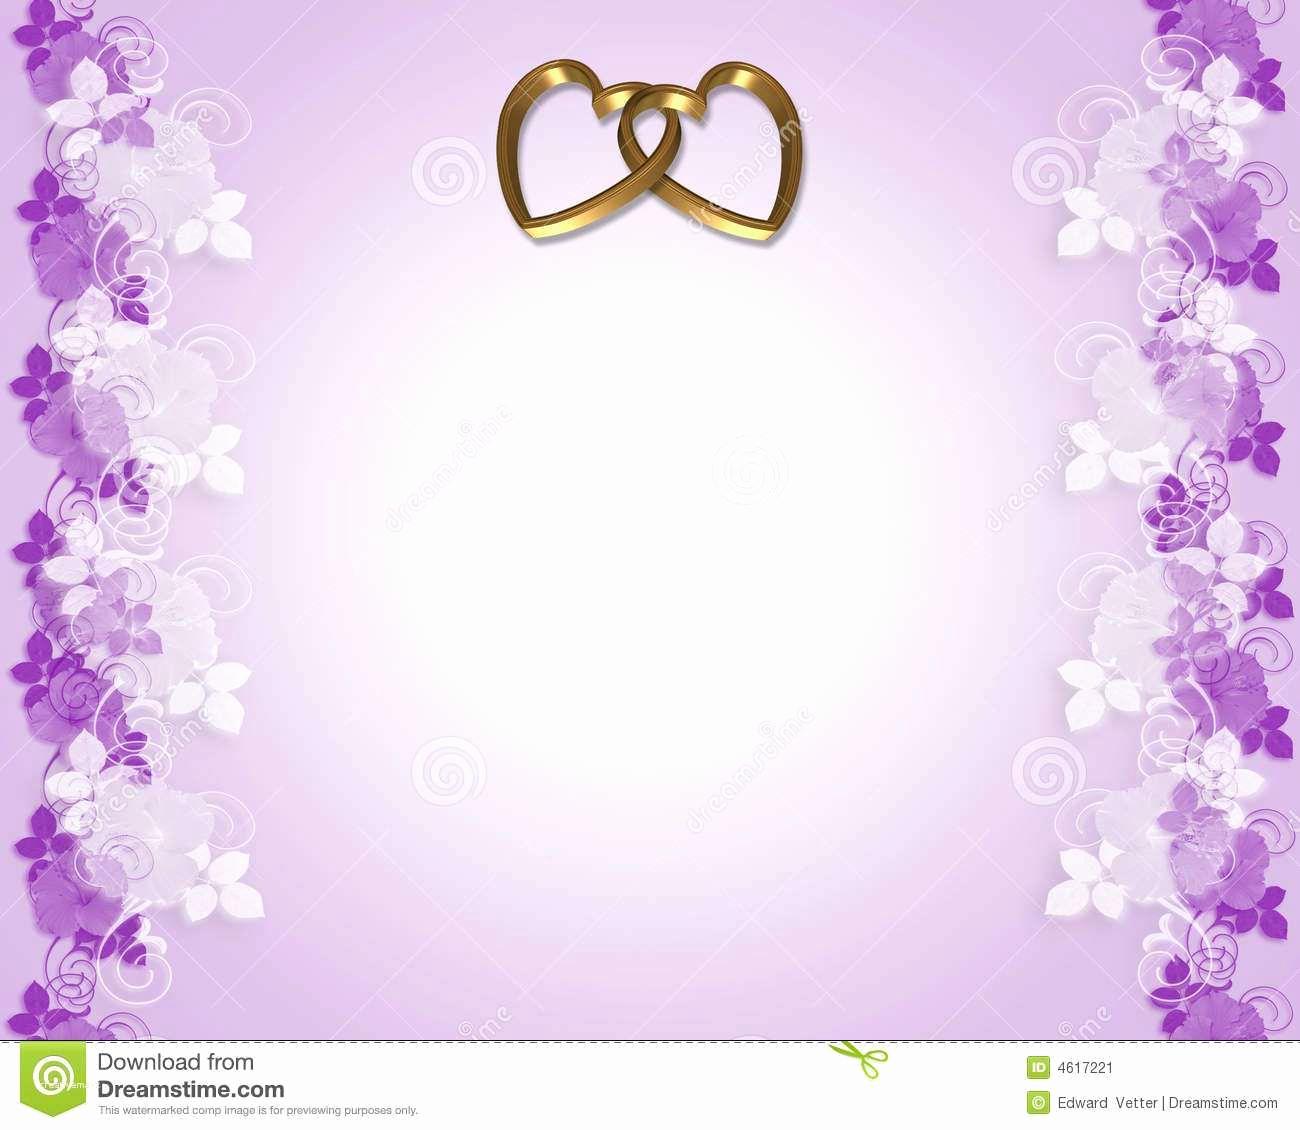 Wedding Invitation Background Designs Awesome Fresh Wedding Invitation Background Designs Free Download